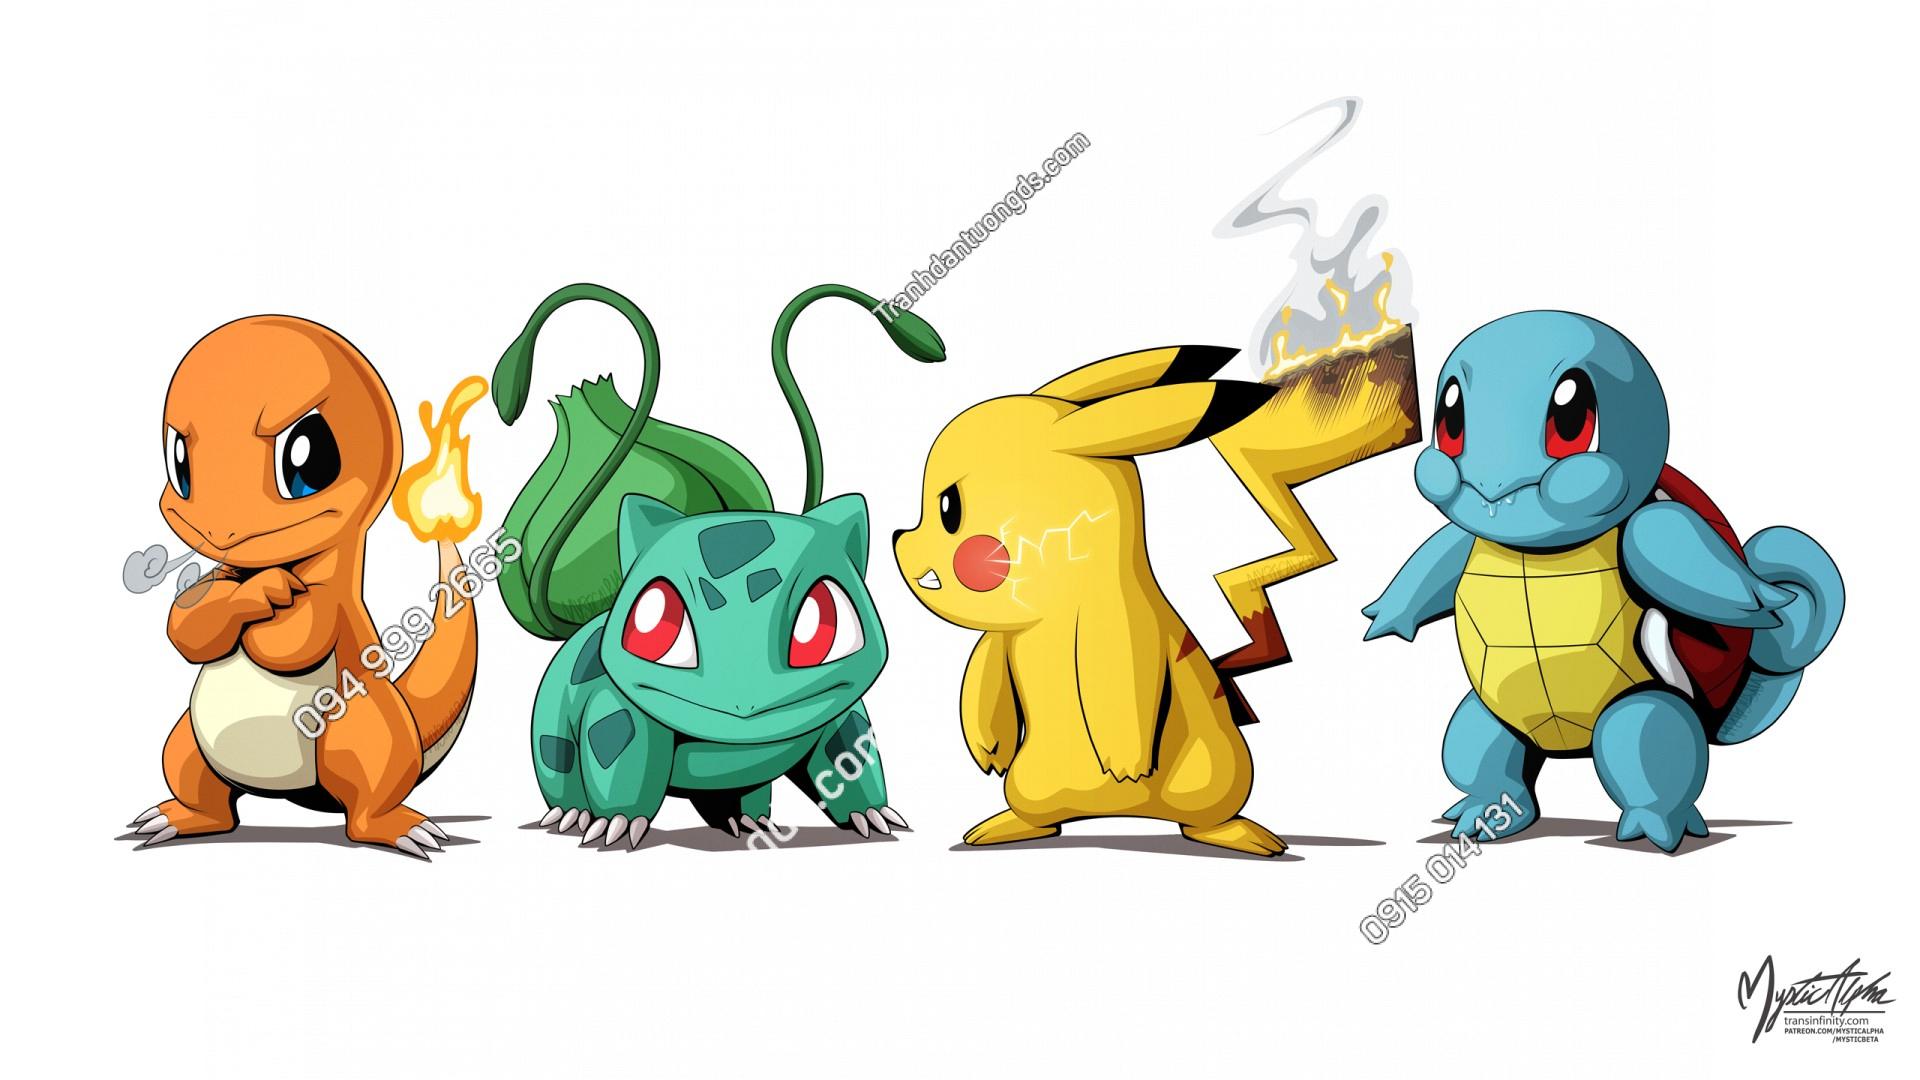 Tranh dán tường Group Pokemon